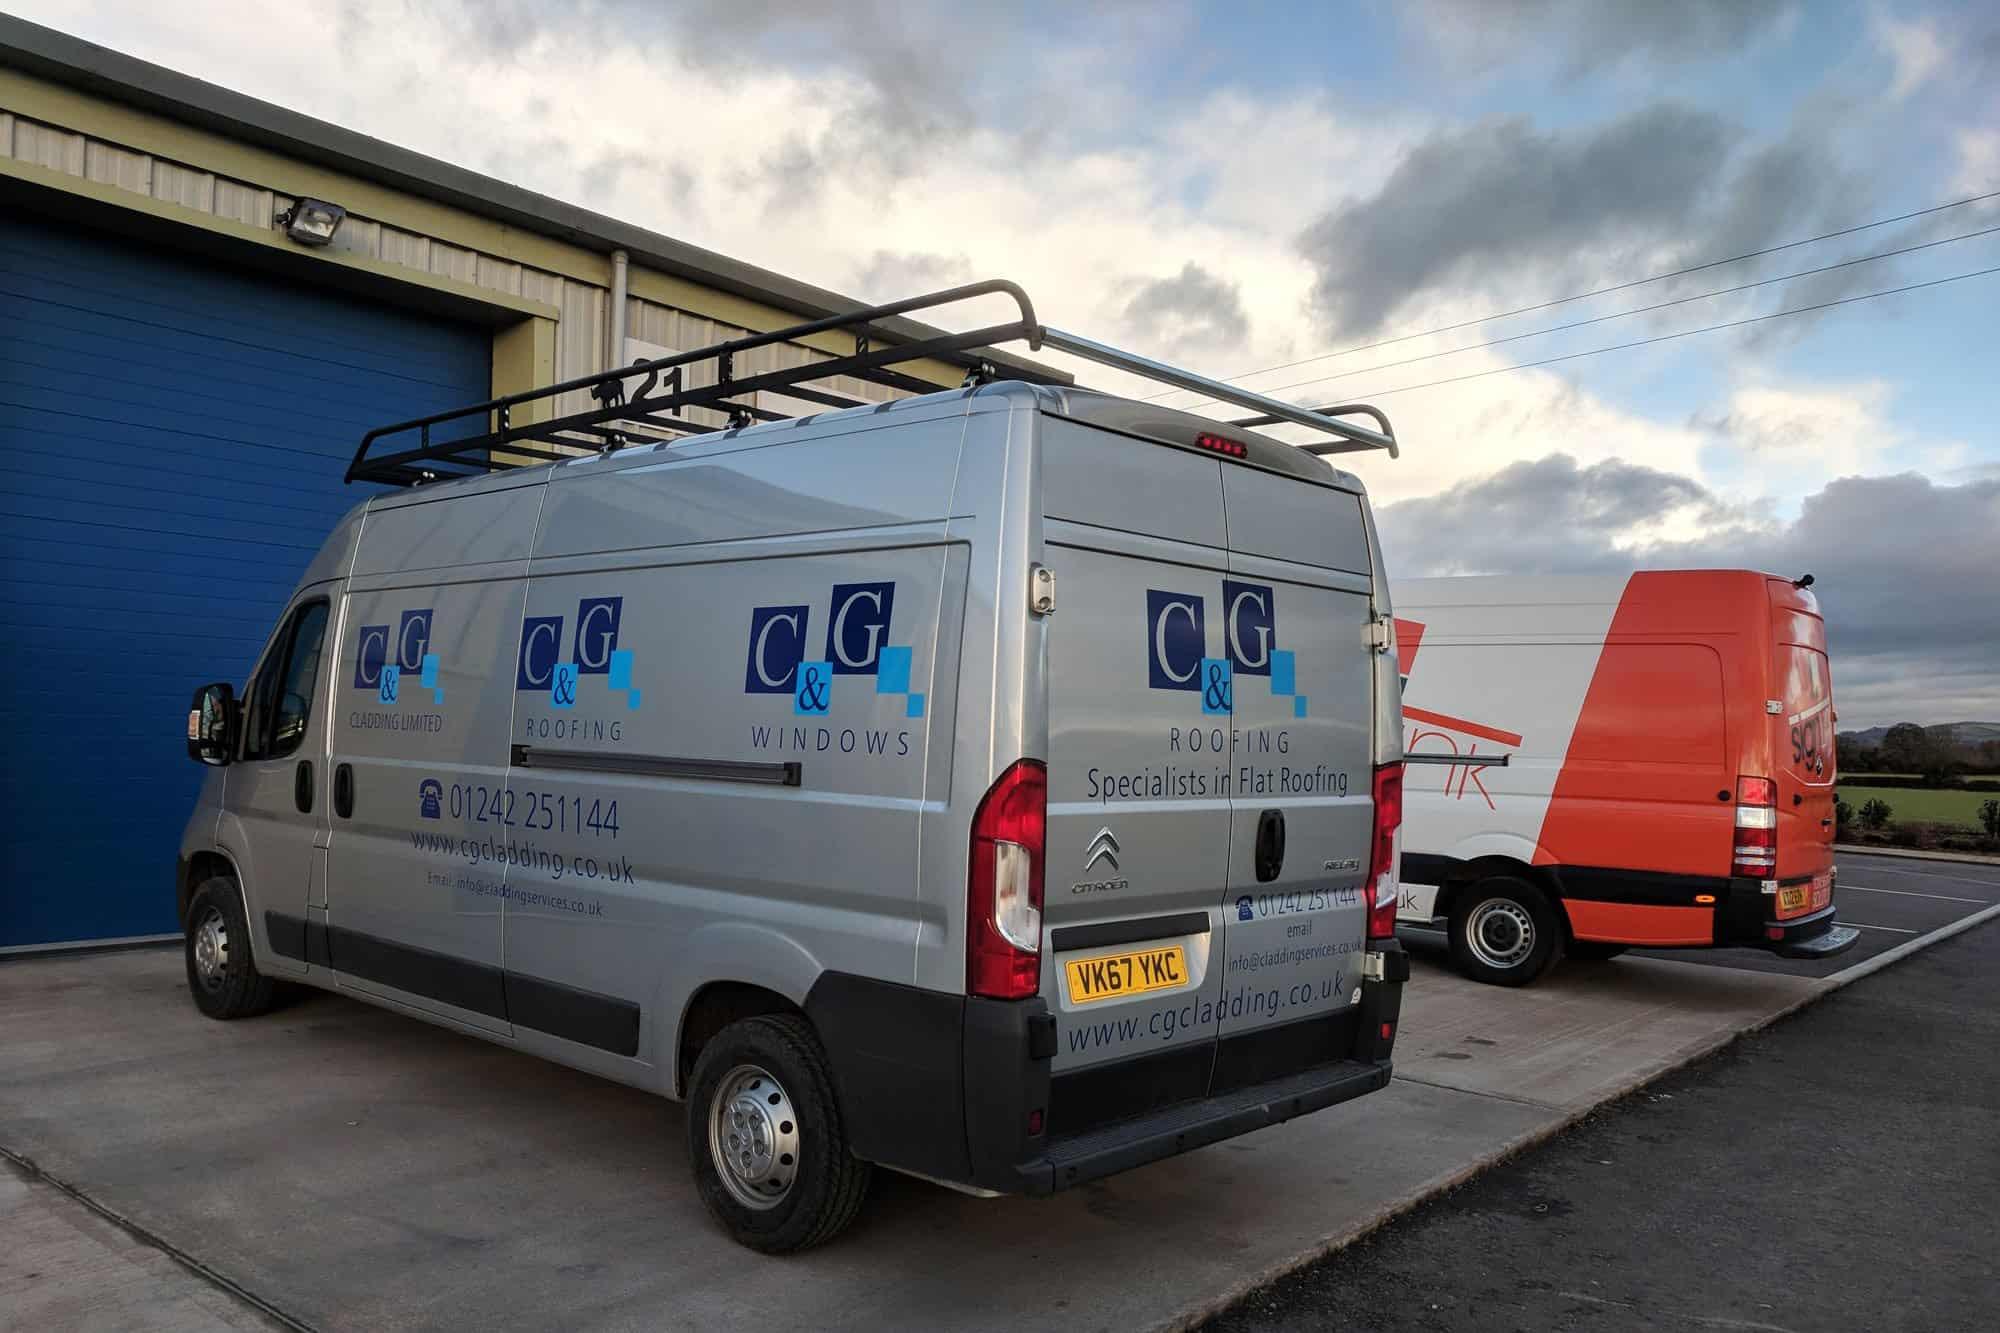 C&G Cladding Dispatch Van